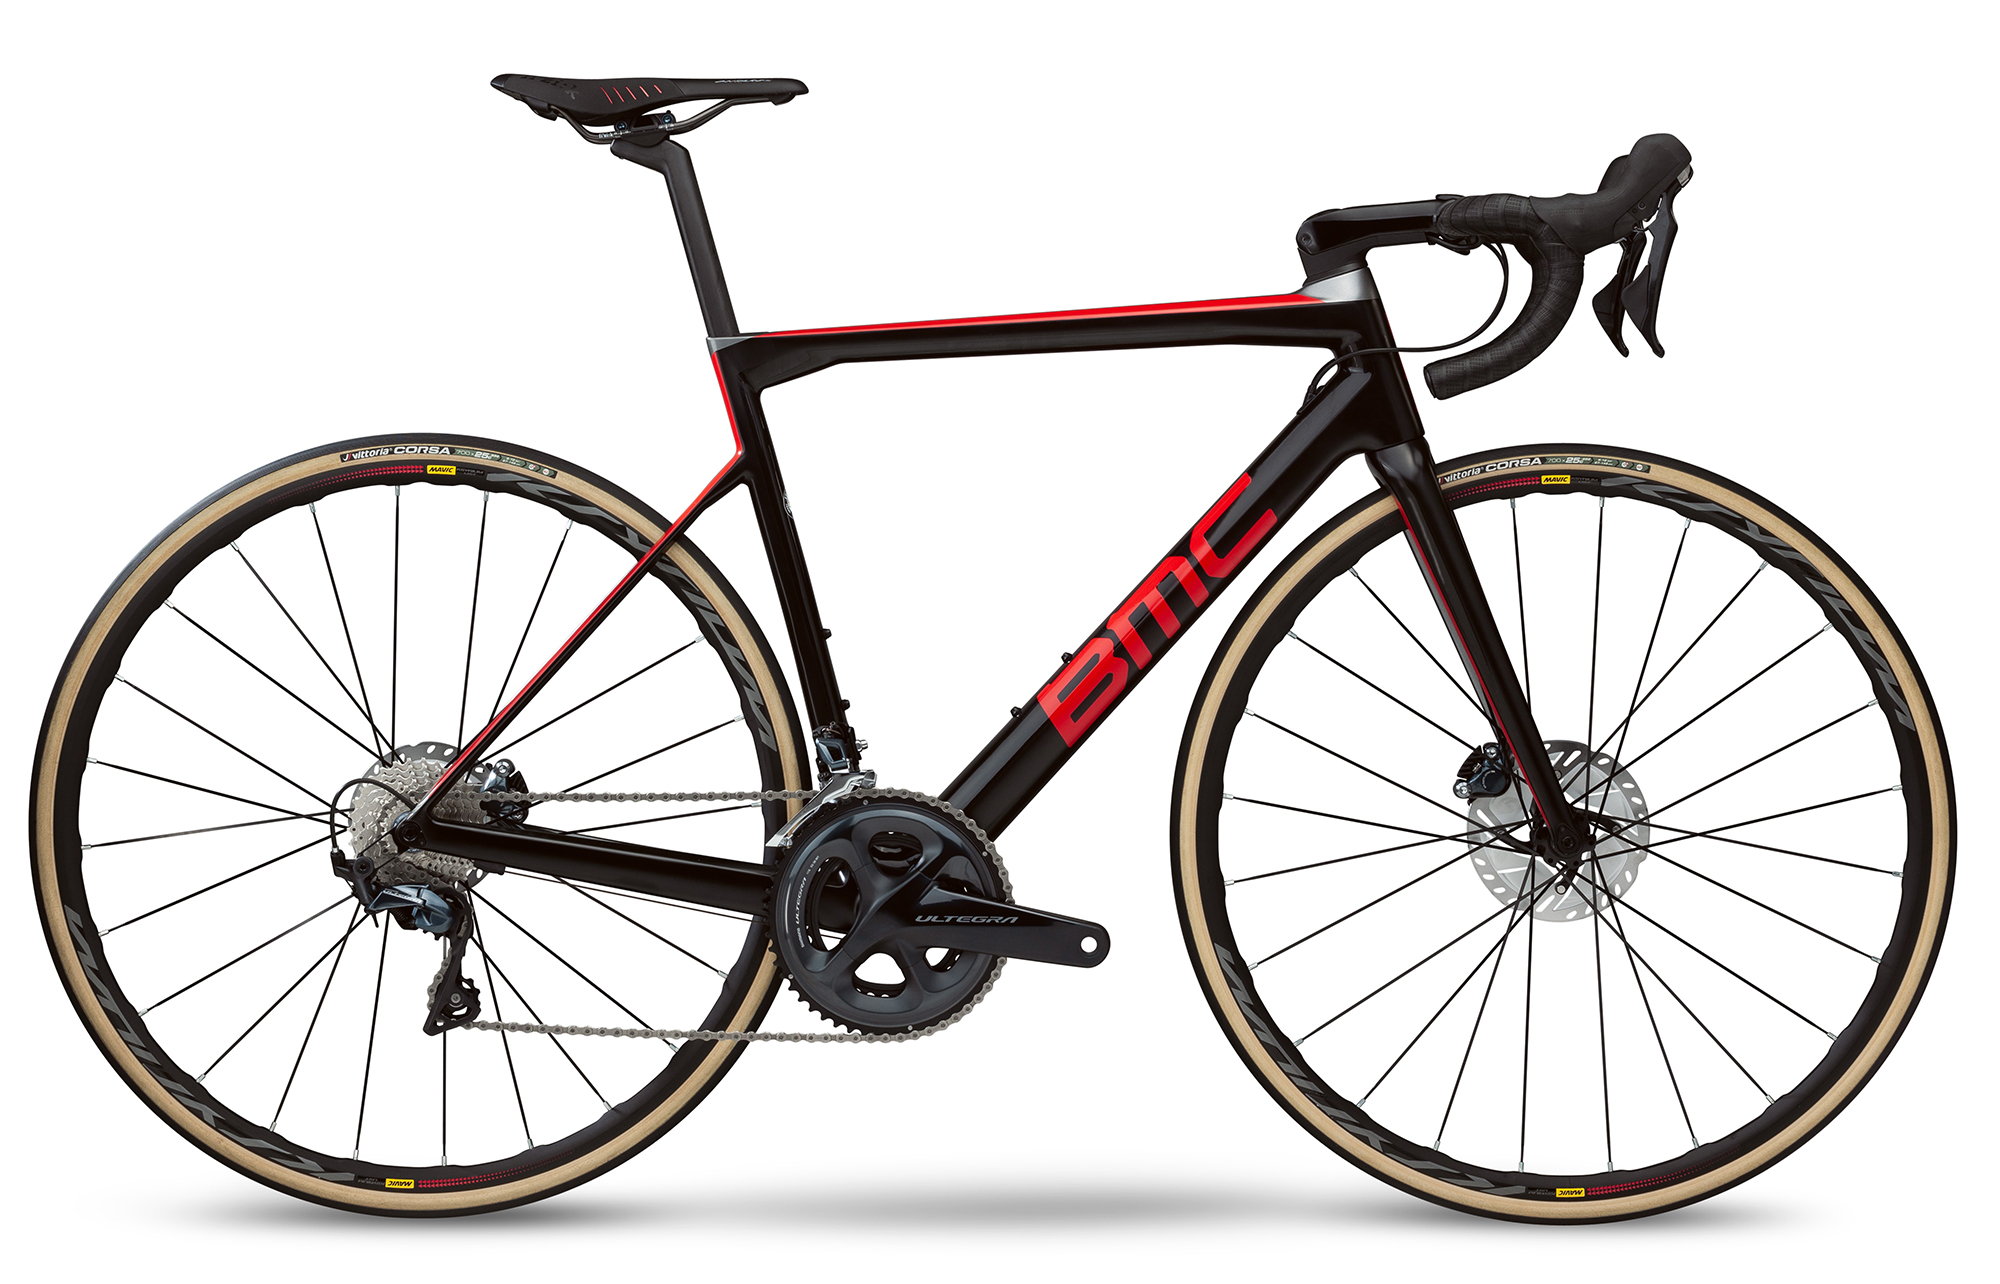 Fastest Road Bike >> BMC Teammachine SLR01 Disc FOUR Bike | R&A Cycles